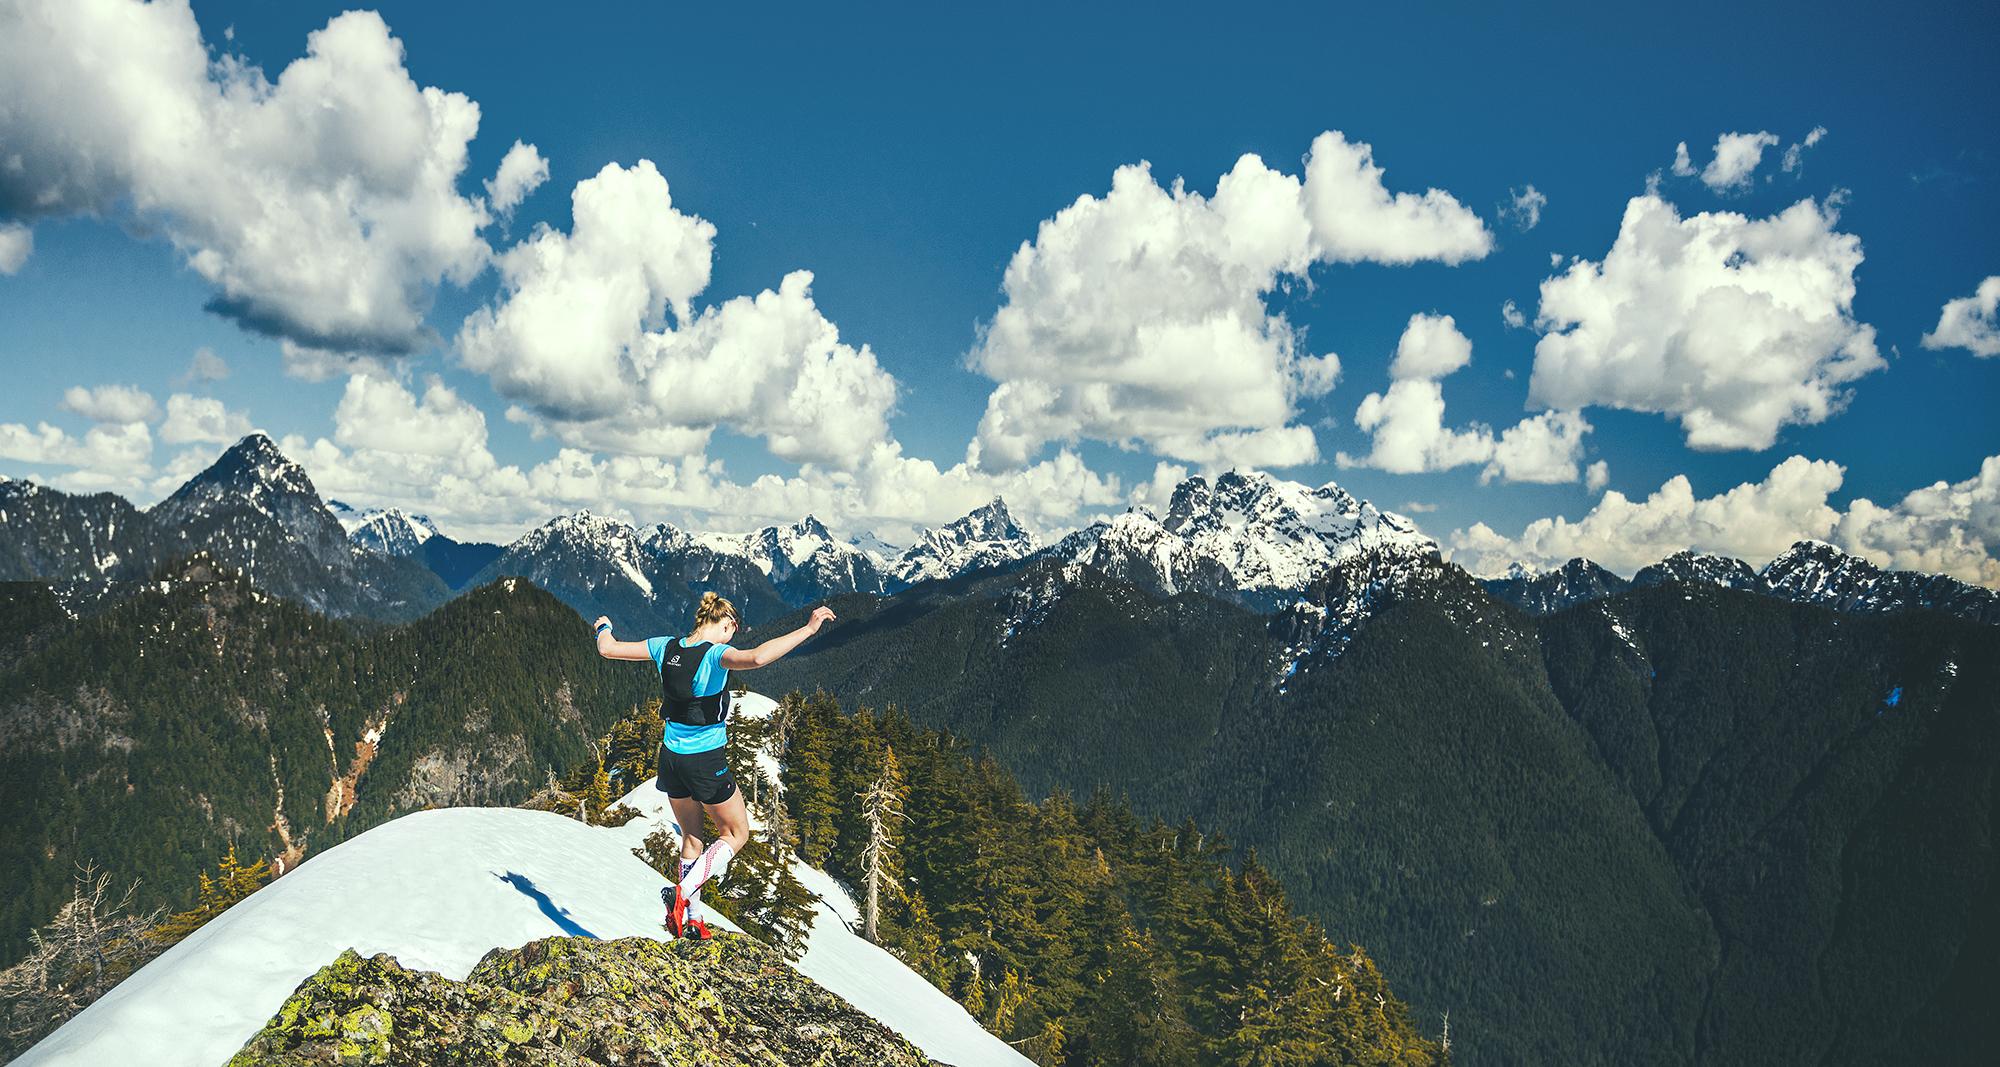 Freya Orban - Salomon Young Gun Athlete by Brice Ferre Studio - Vancouver Adventure Photographer